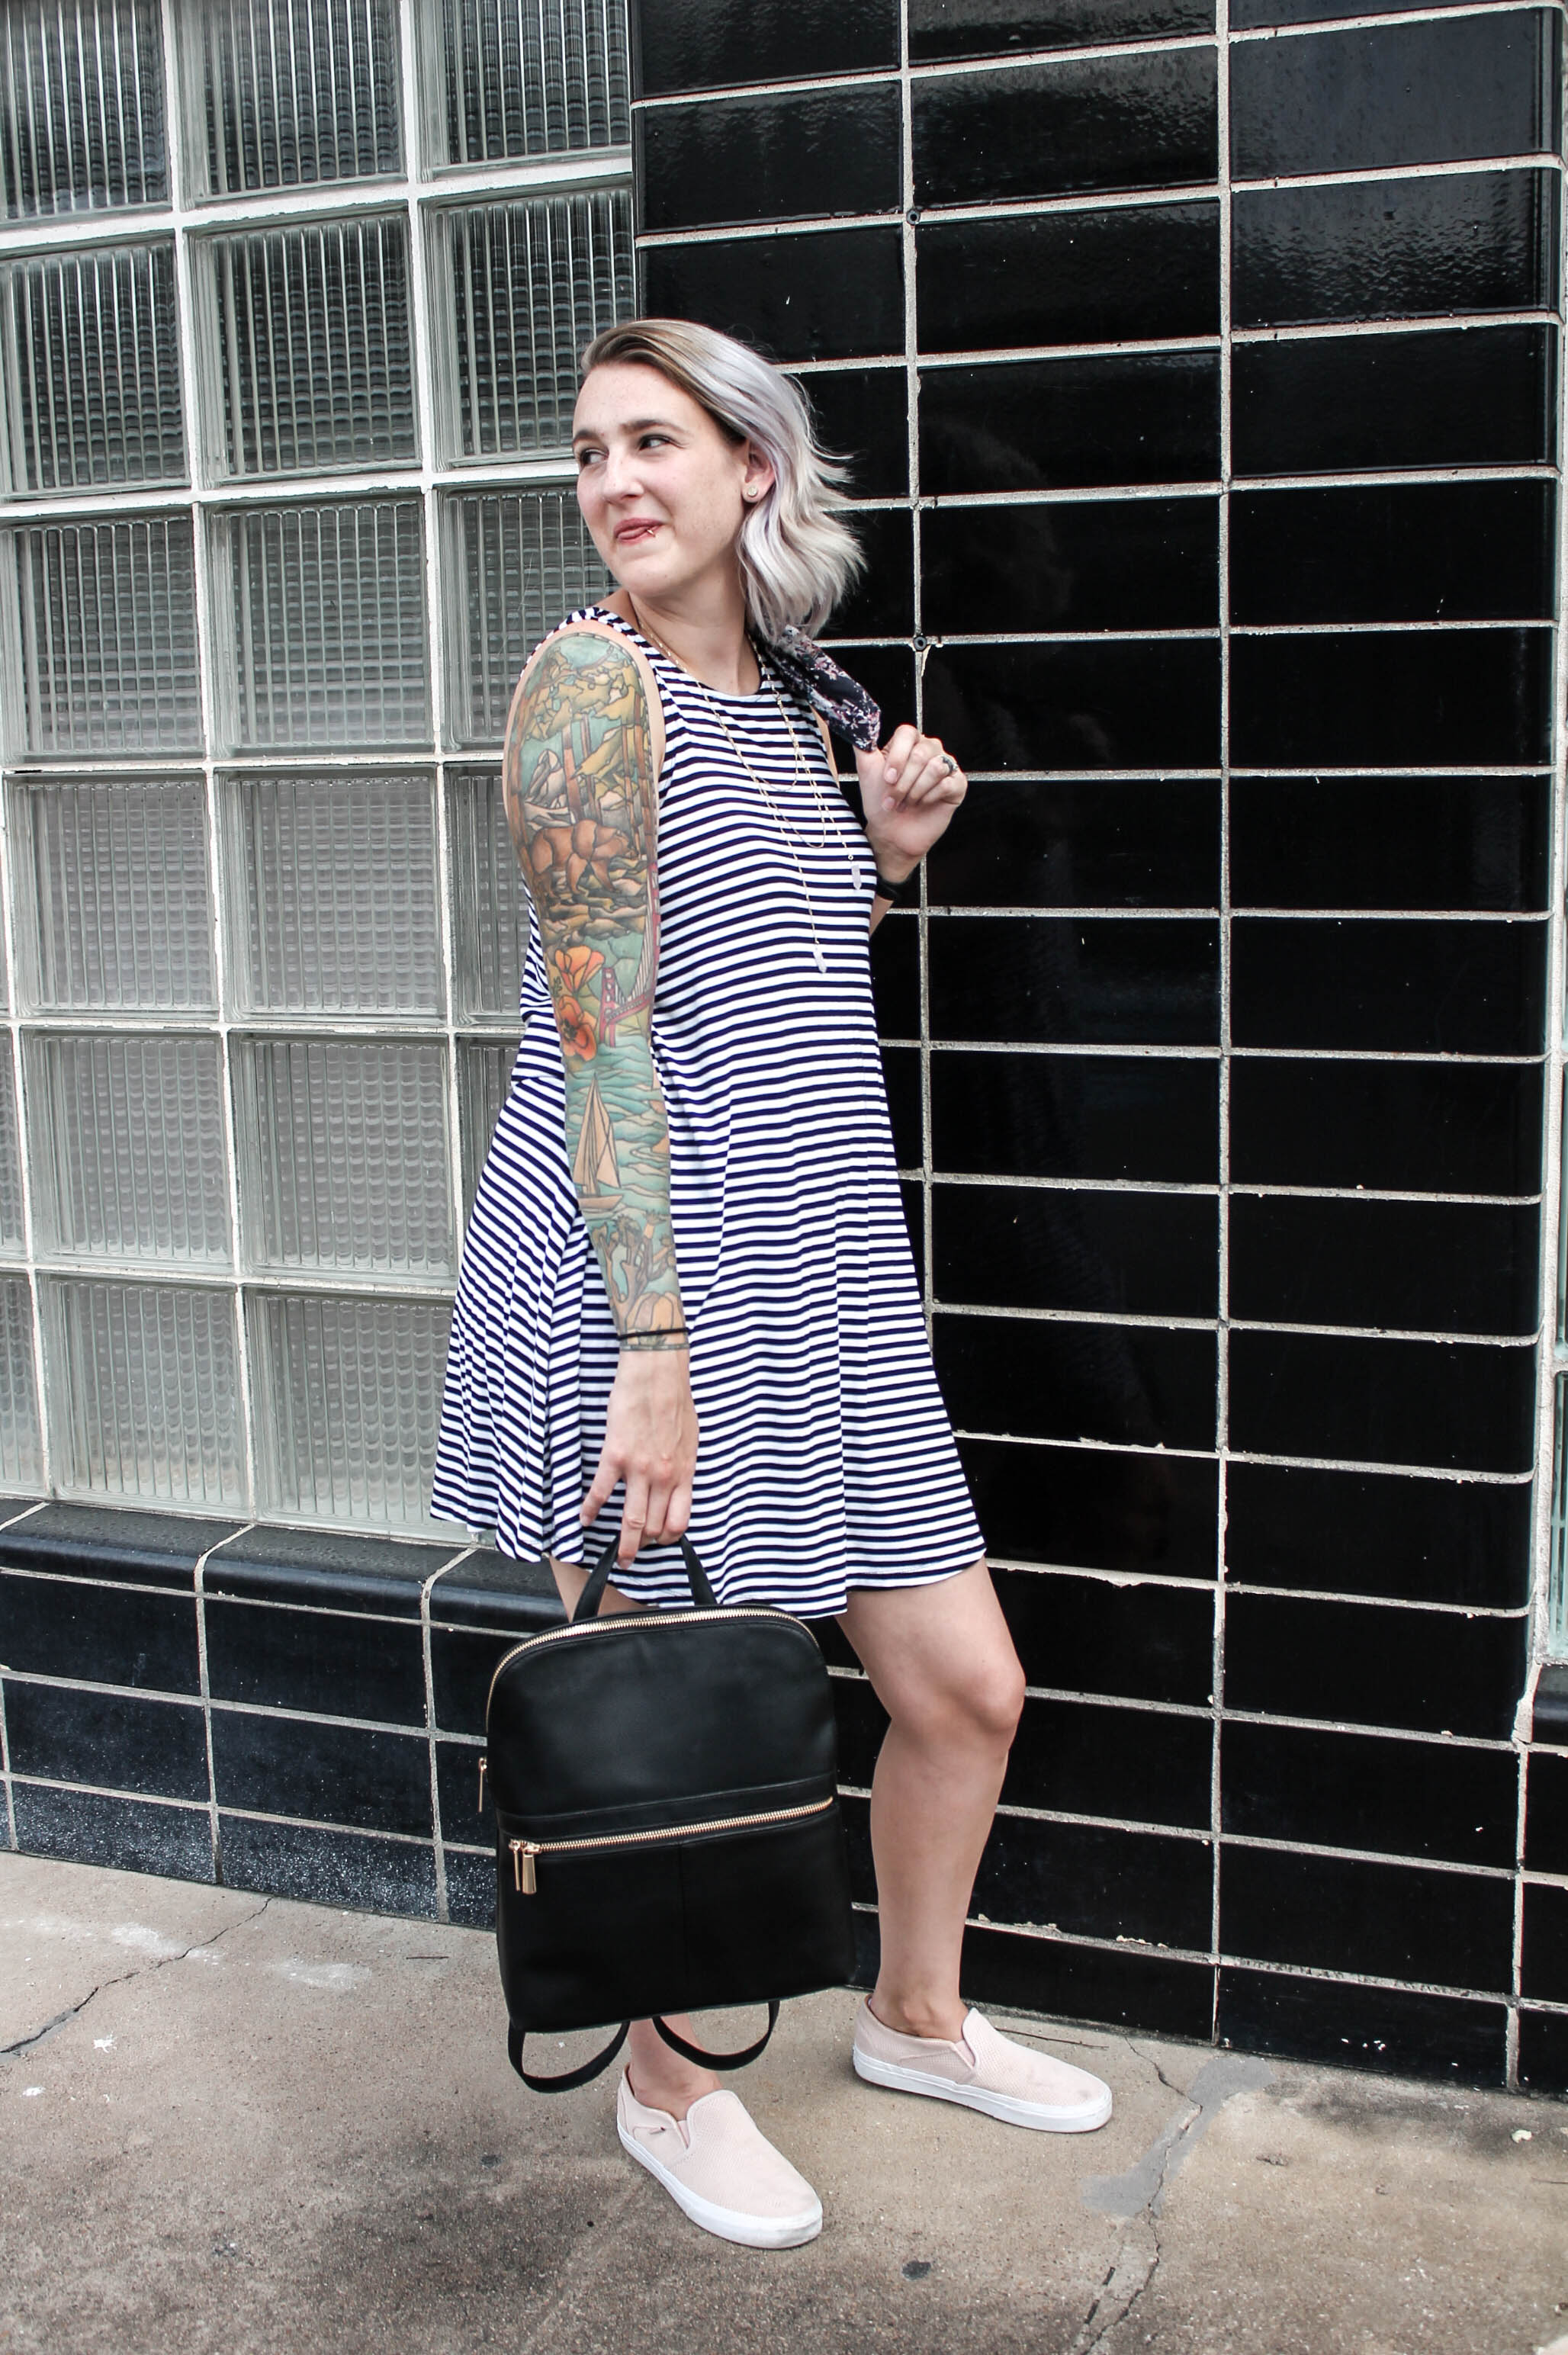 women's summer outfit